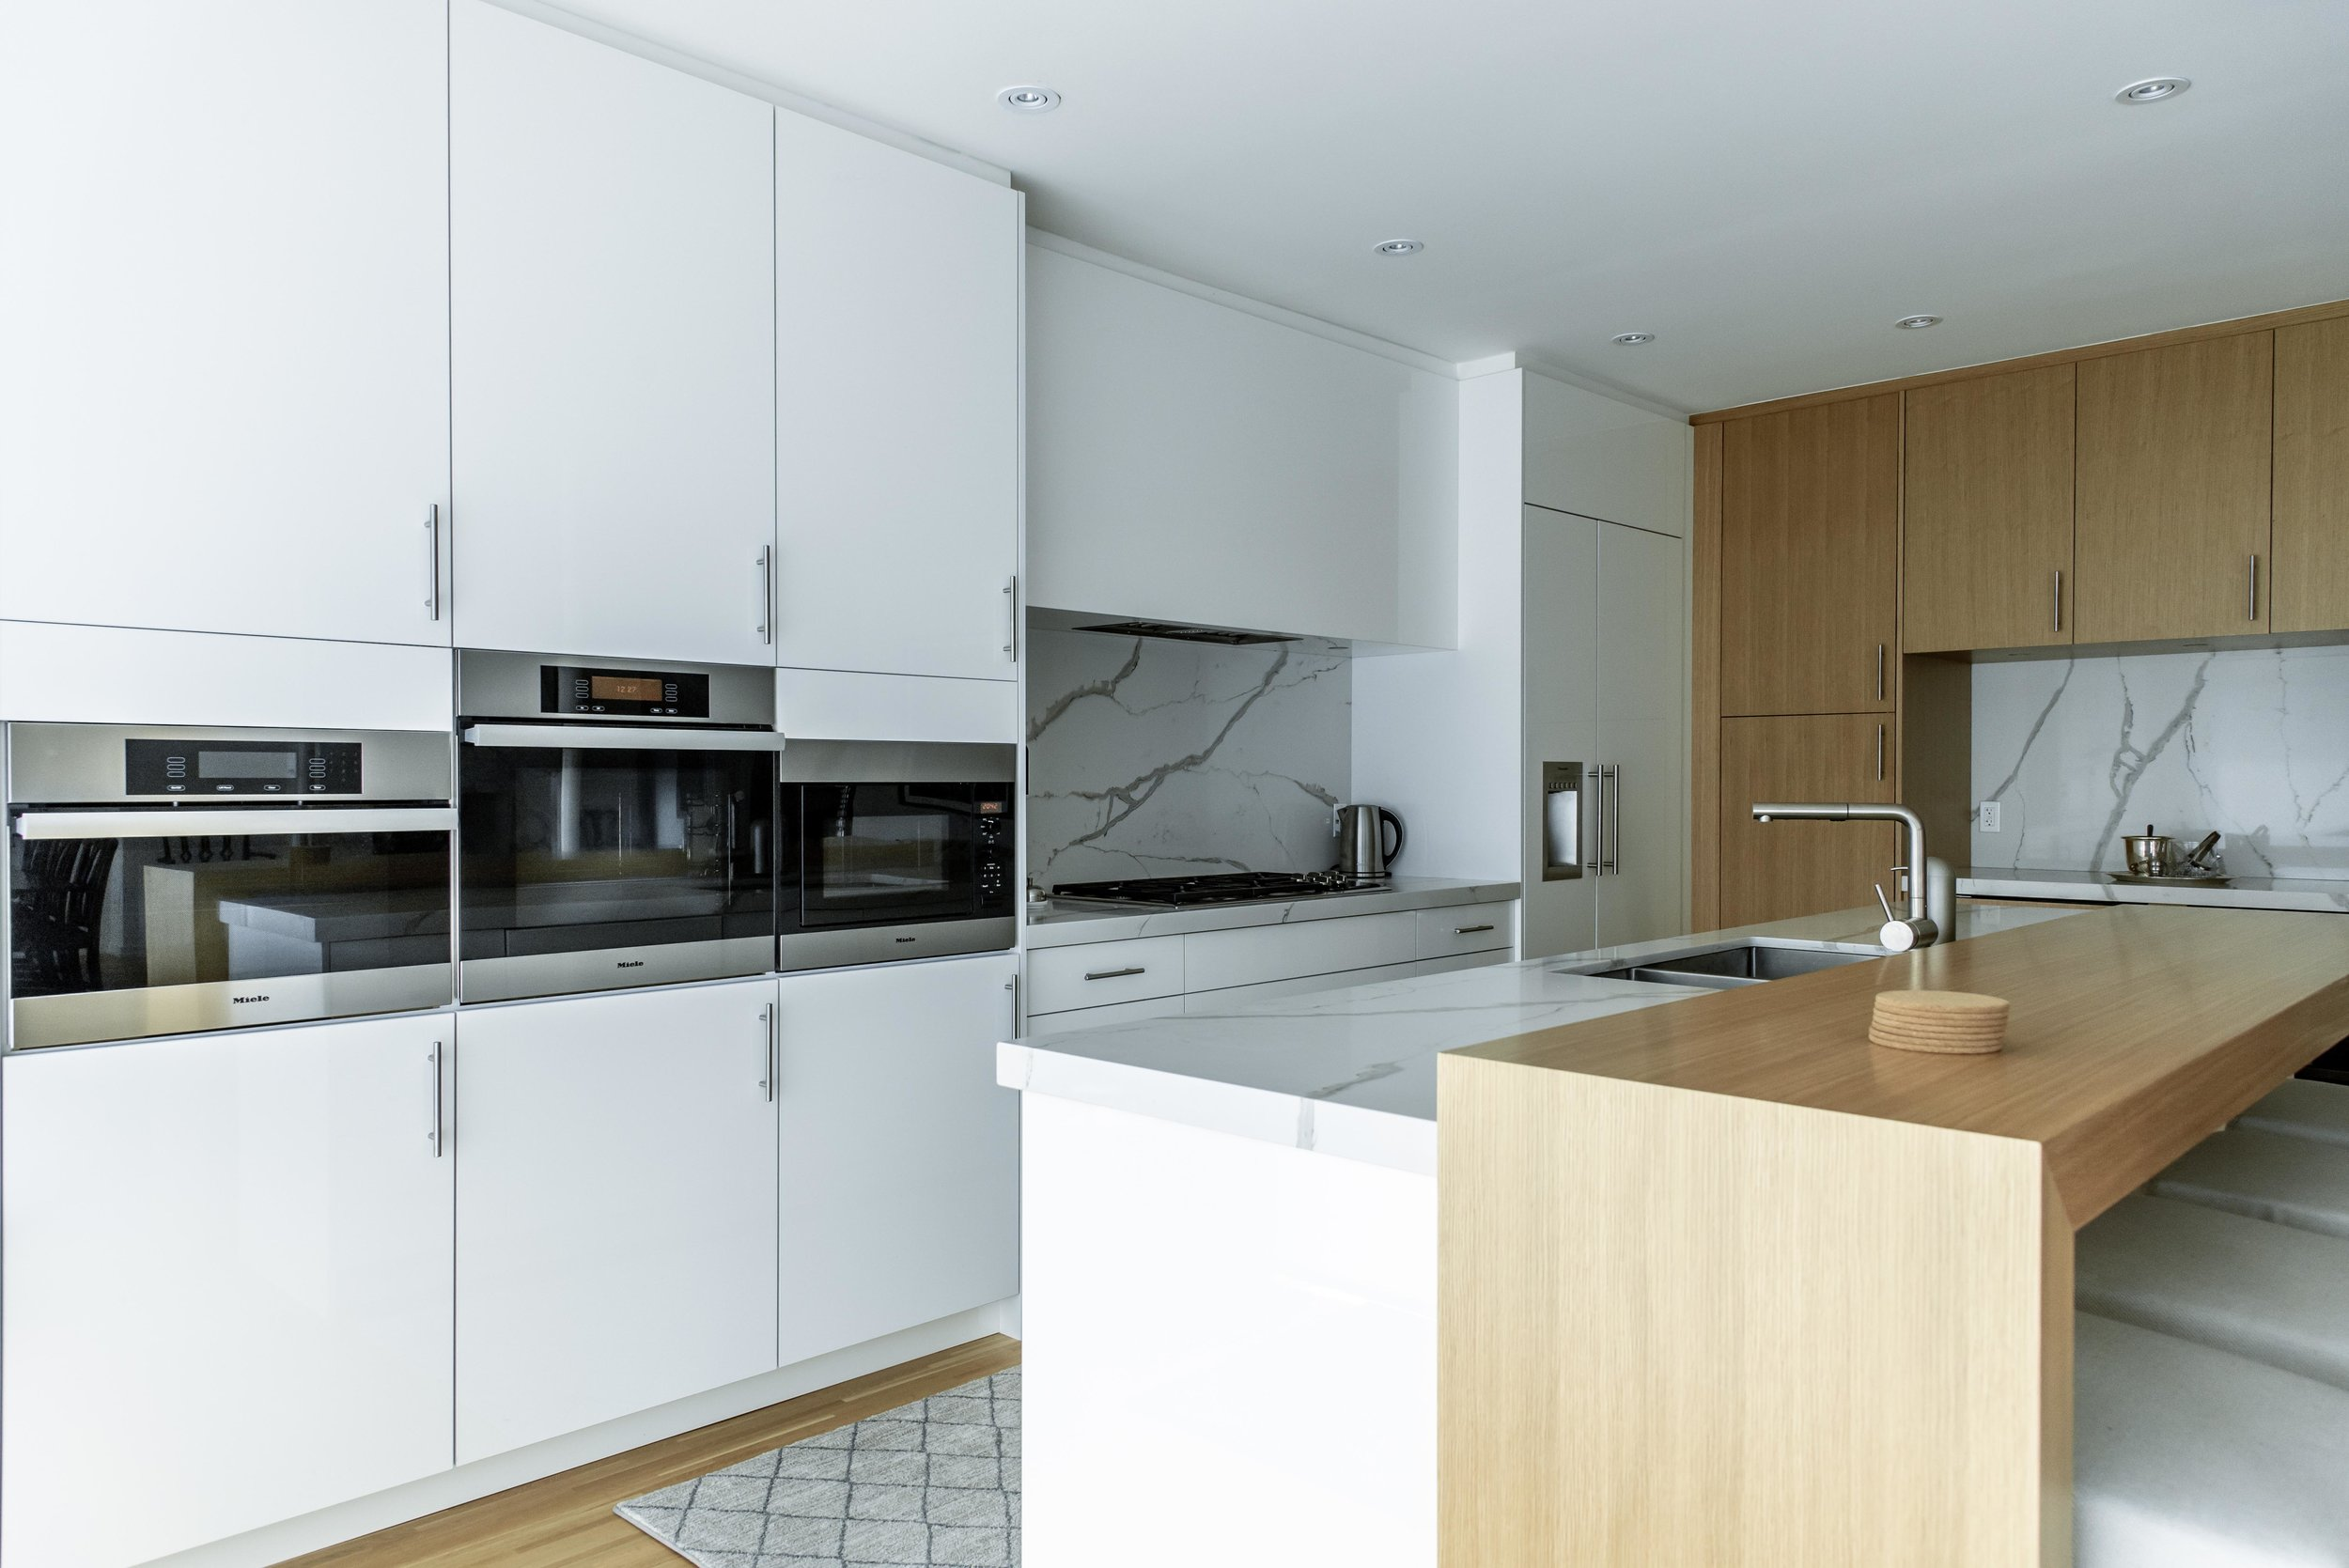 DSC_9123 - Kitchen 2 Low.jpg